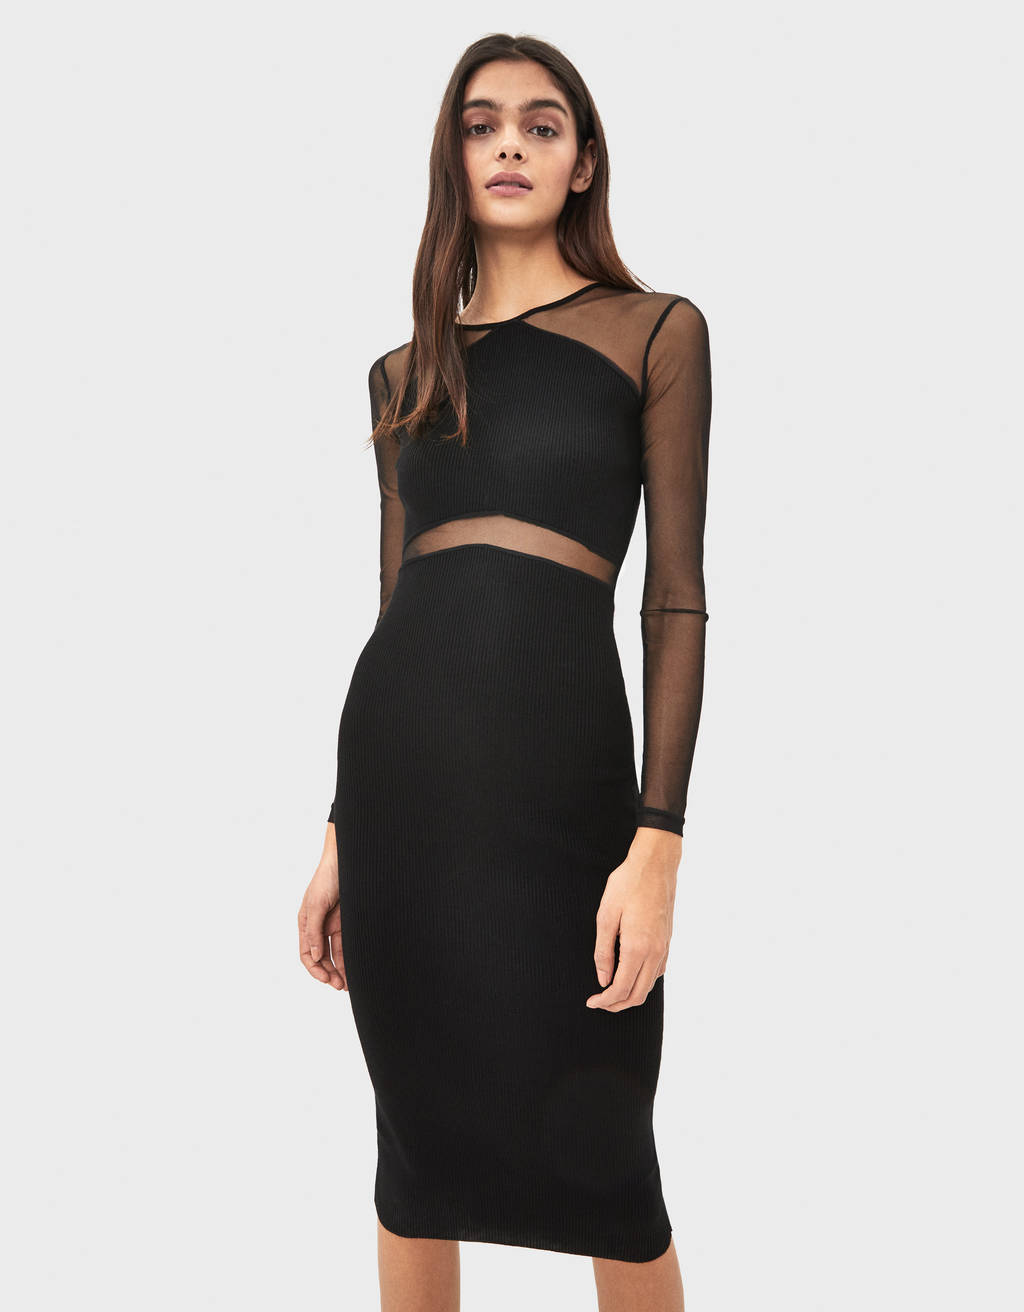 Midi dress with sheer detailing